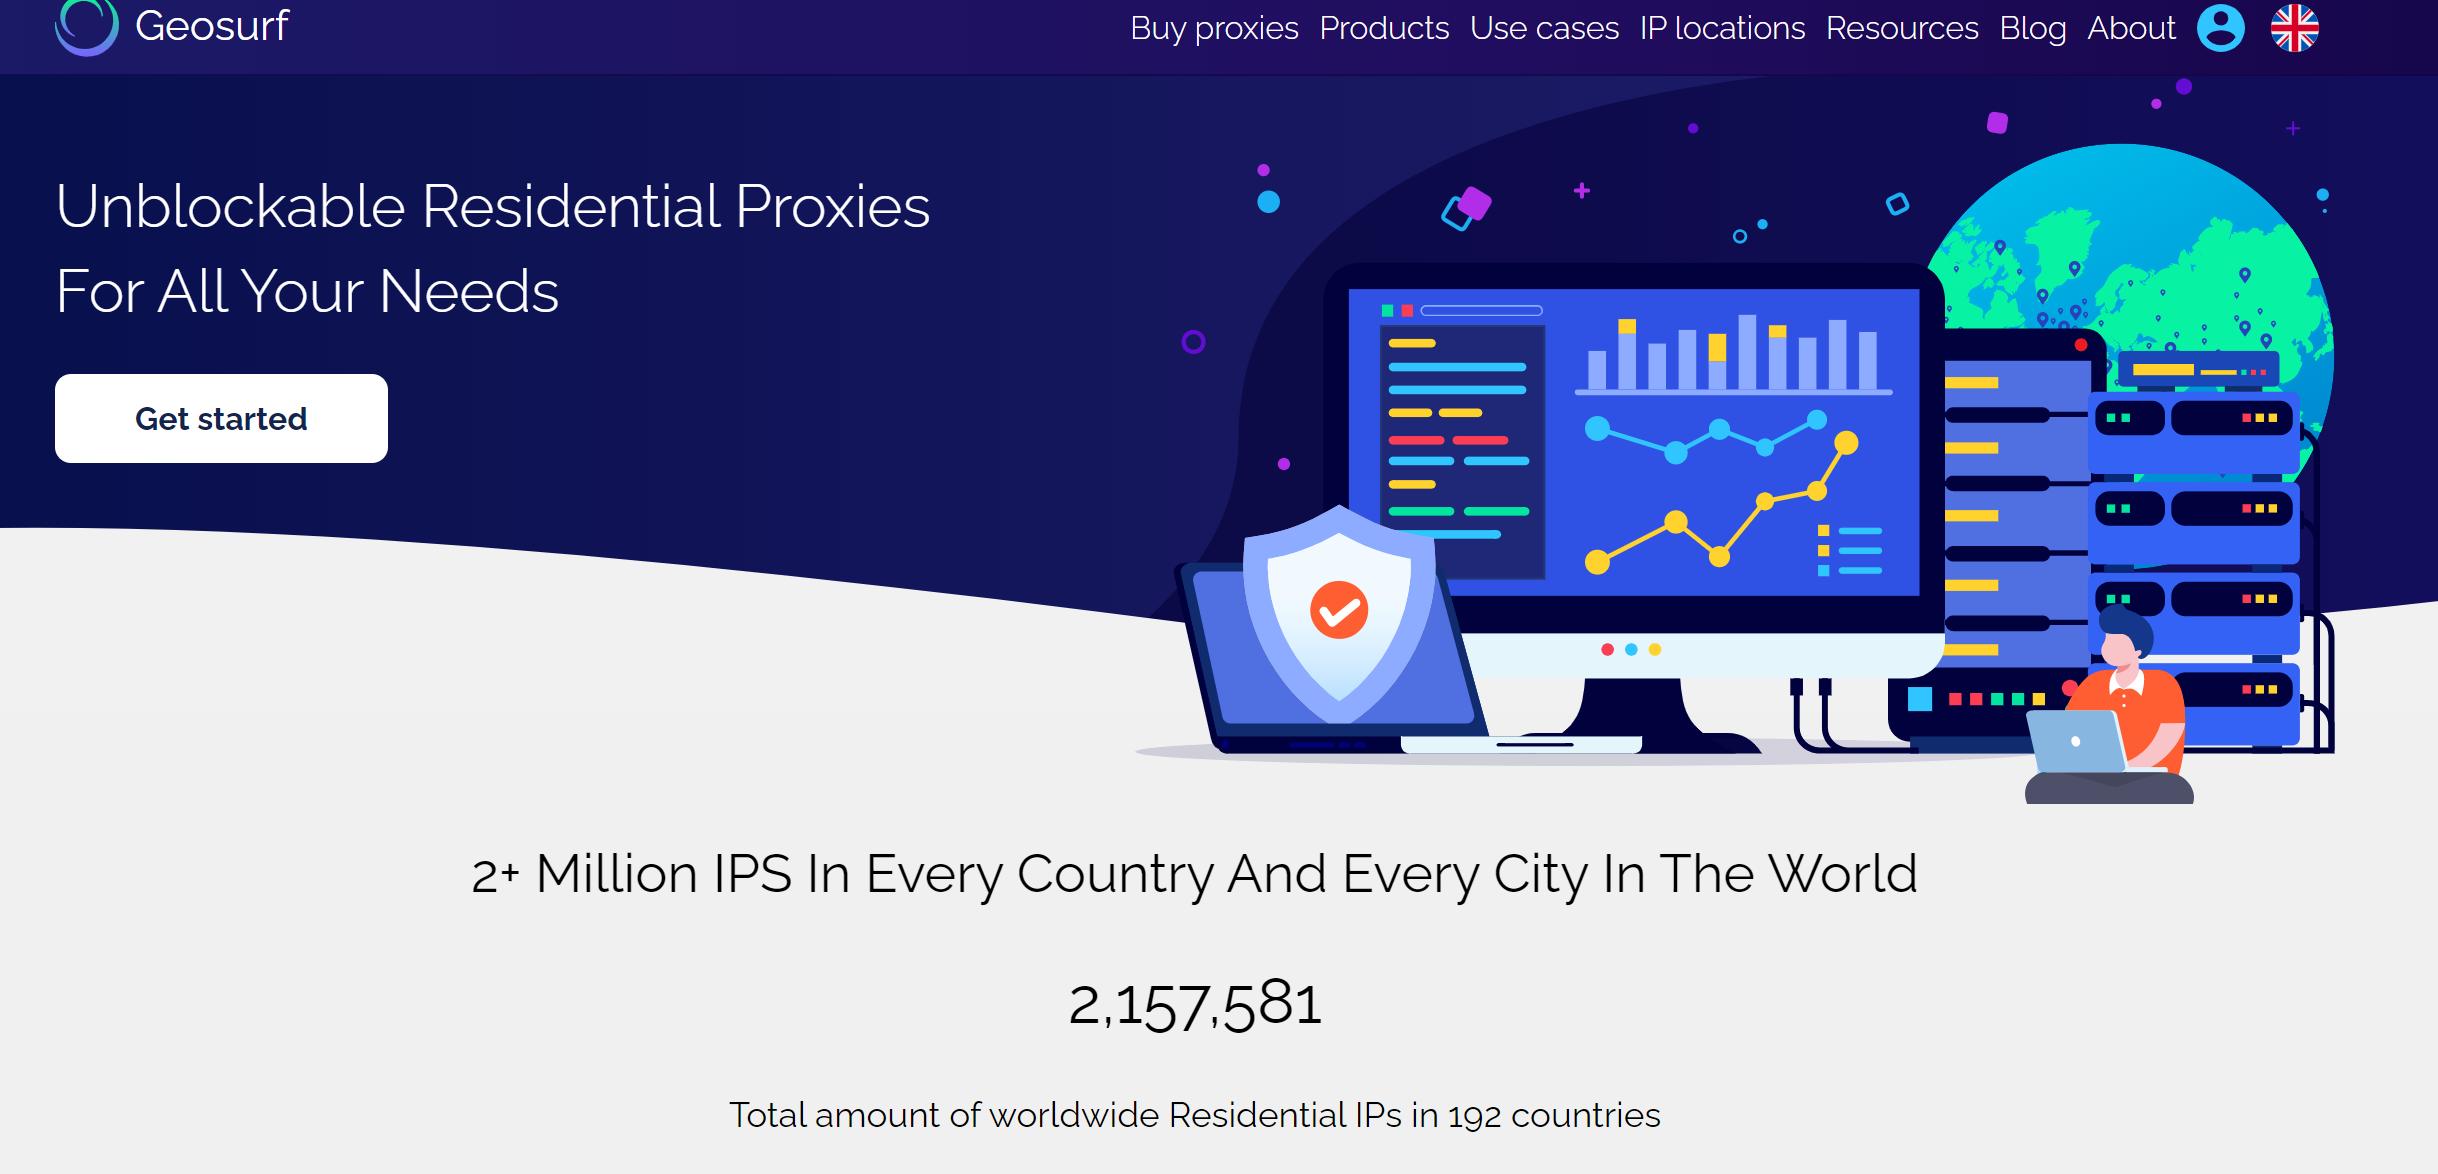 Geosurf proxies network